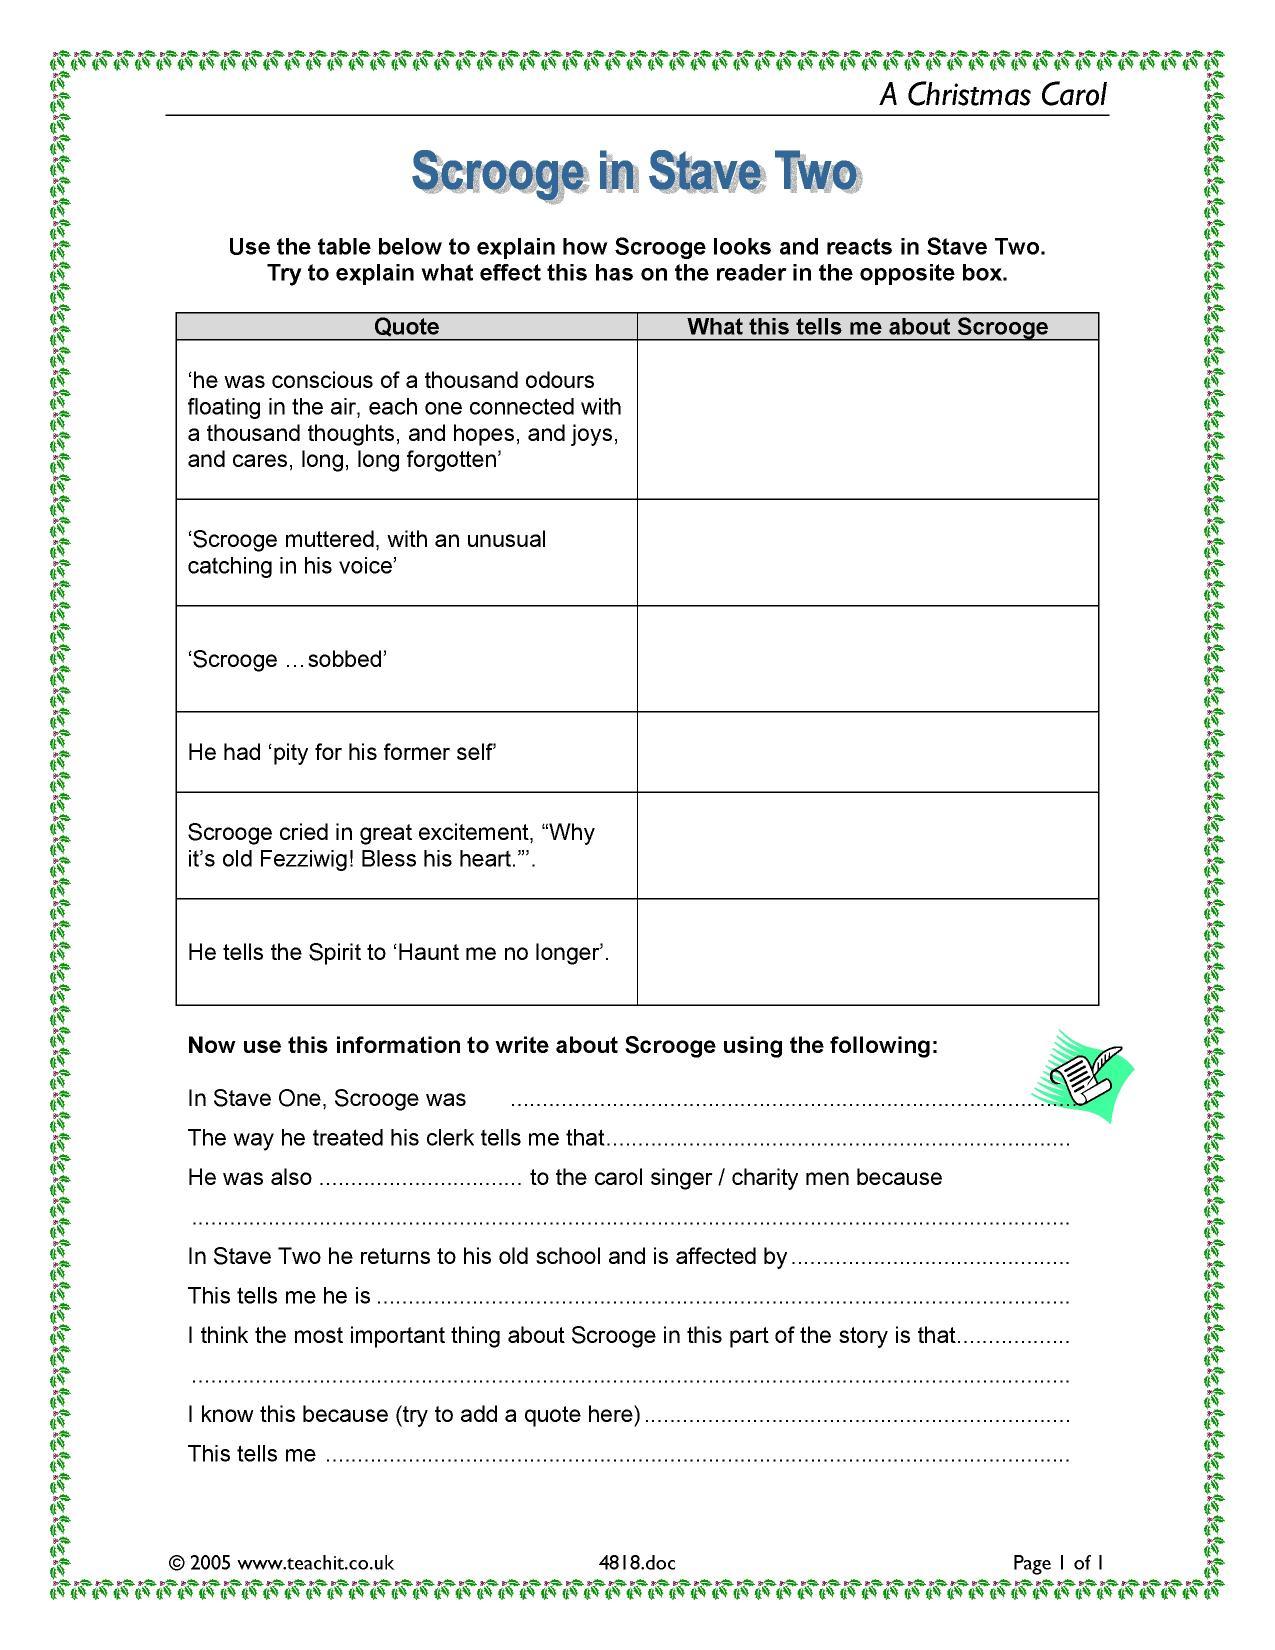 A Christmas Carol Stave 1 Summary.Ks3 Prose A Christmas Carol By Charles Dickens Teachit